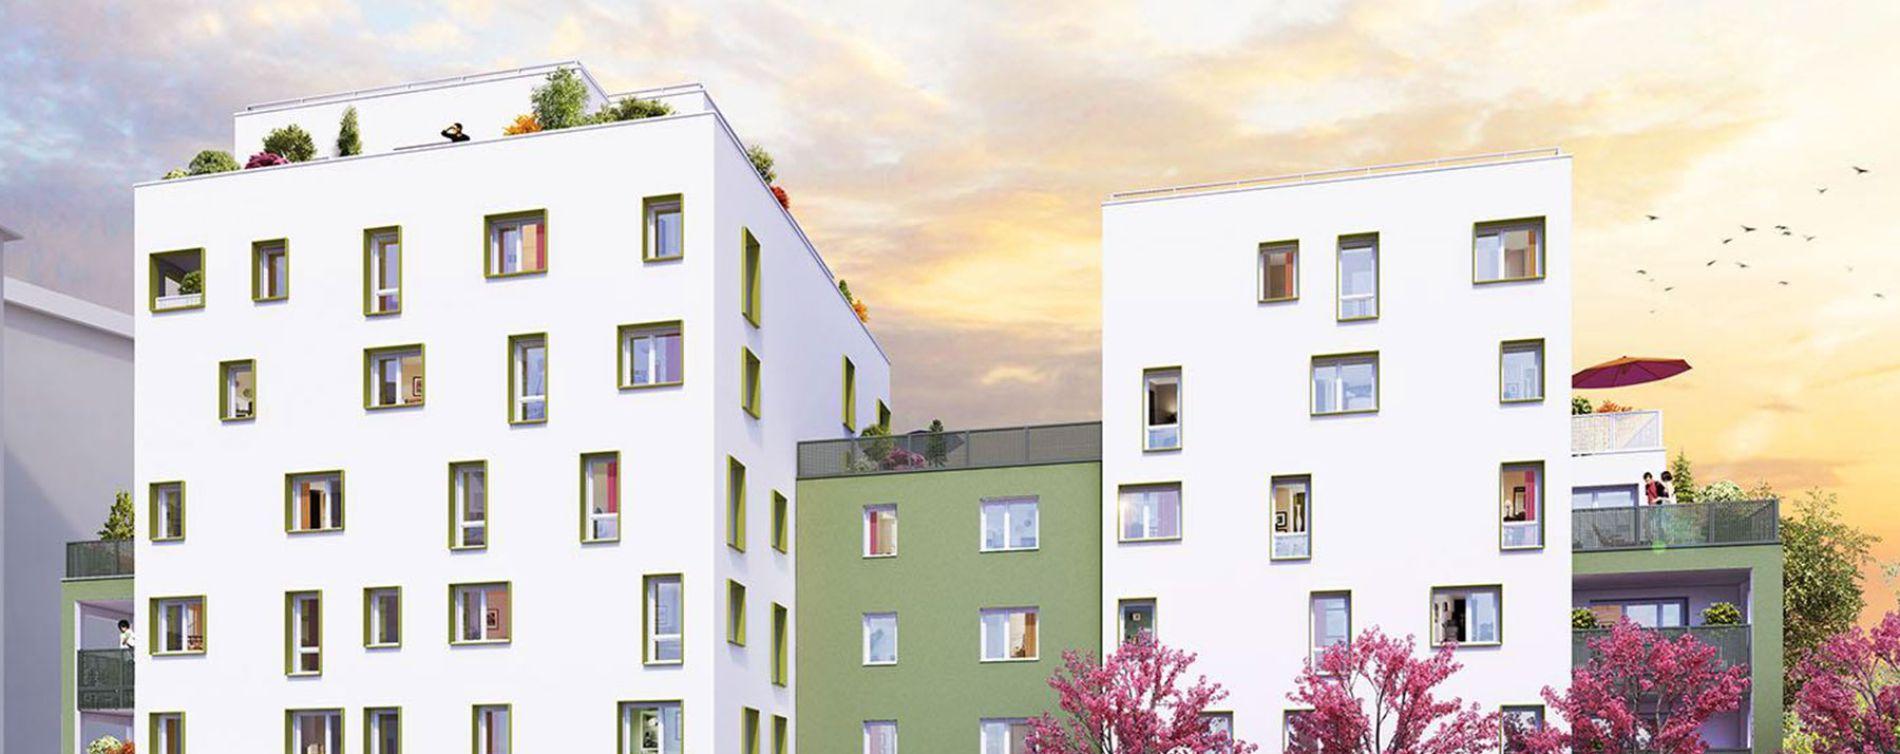 Résidence Atyka à Villeurbanne